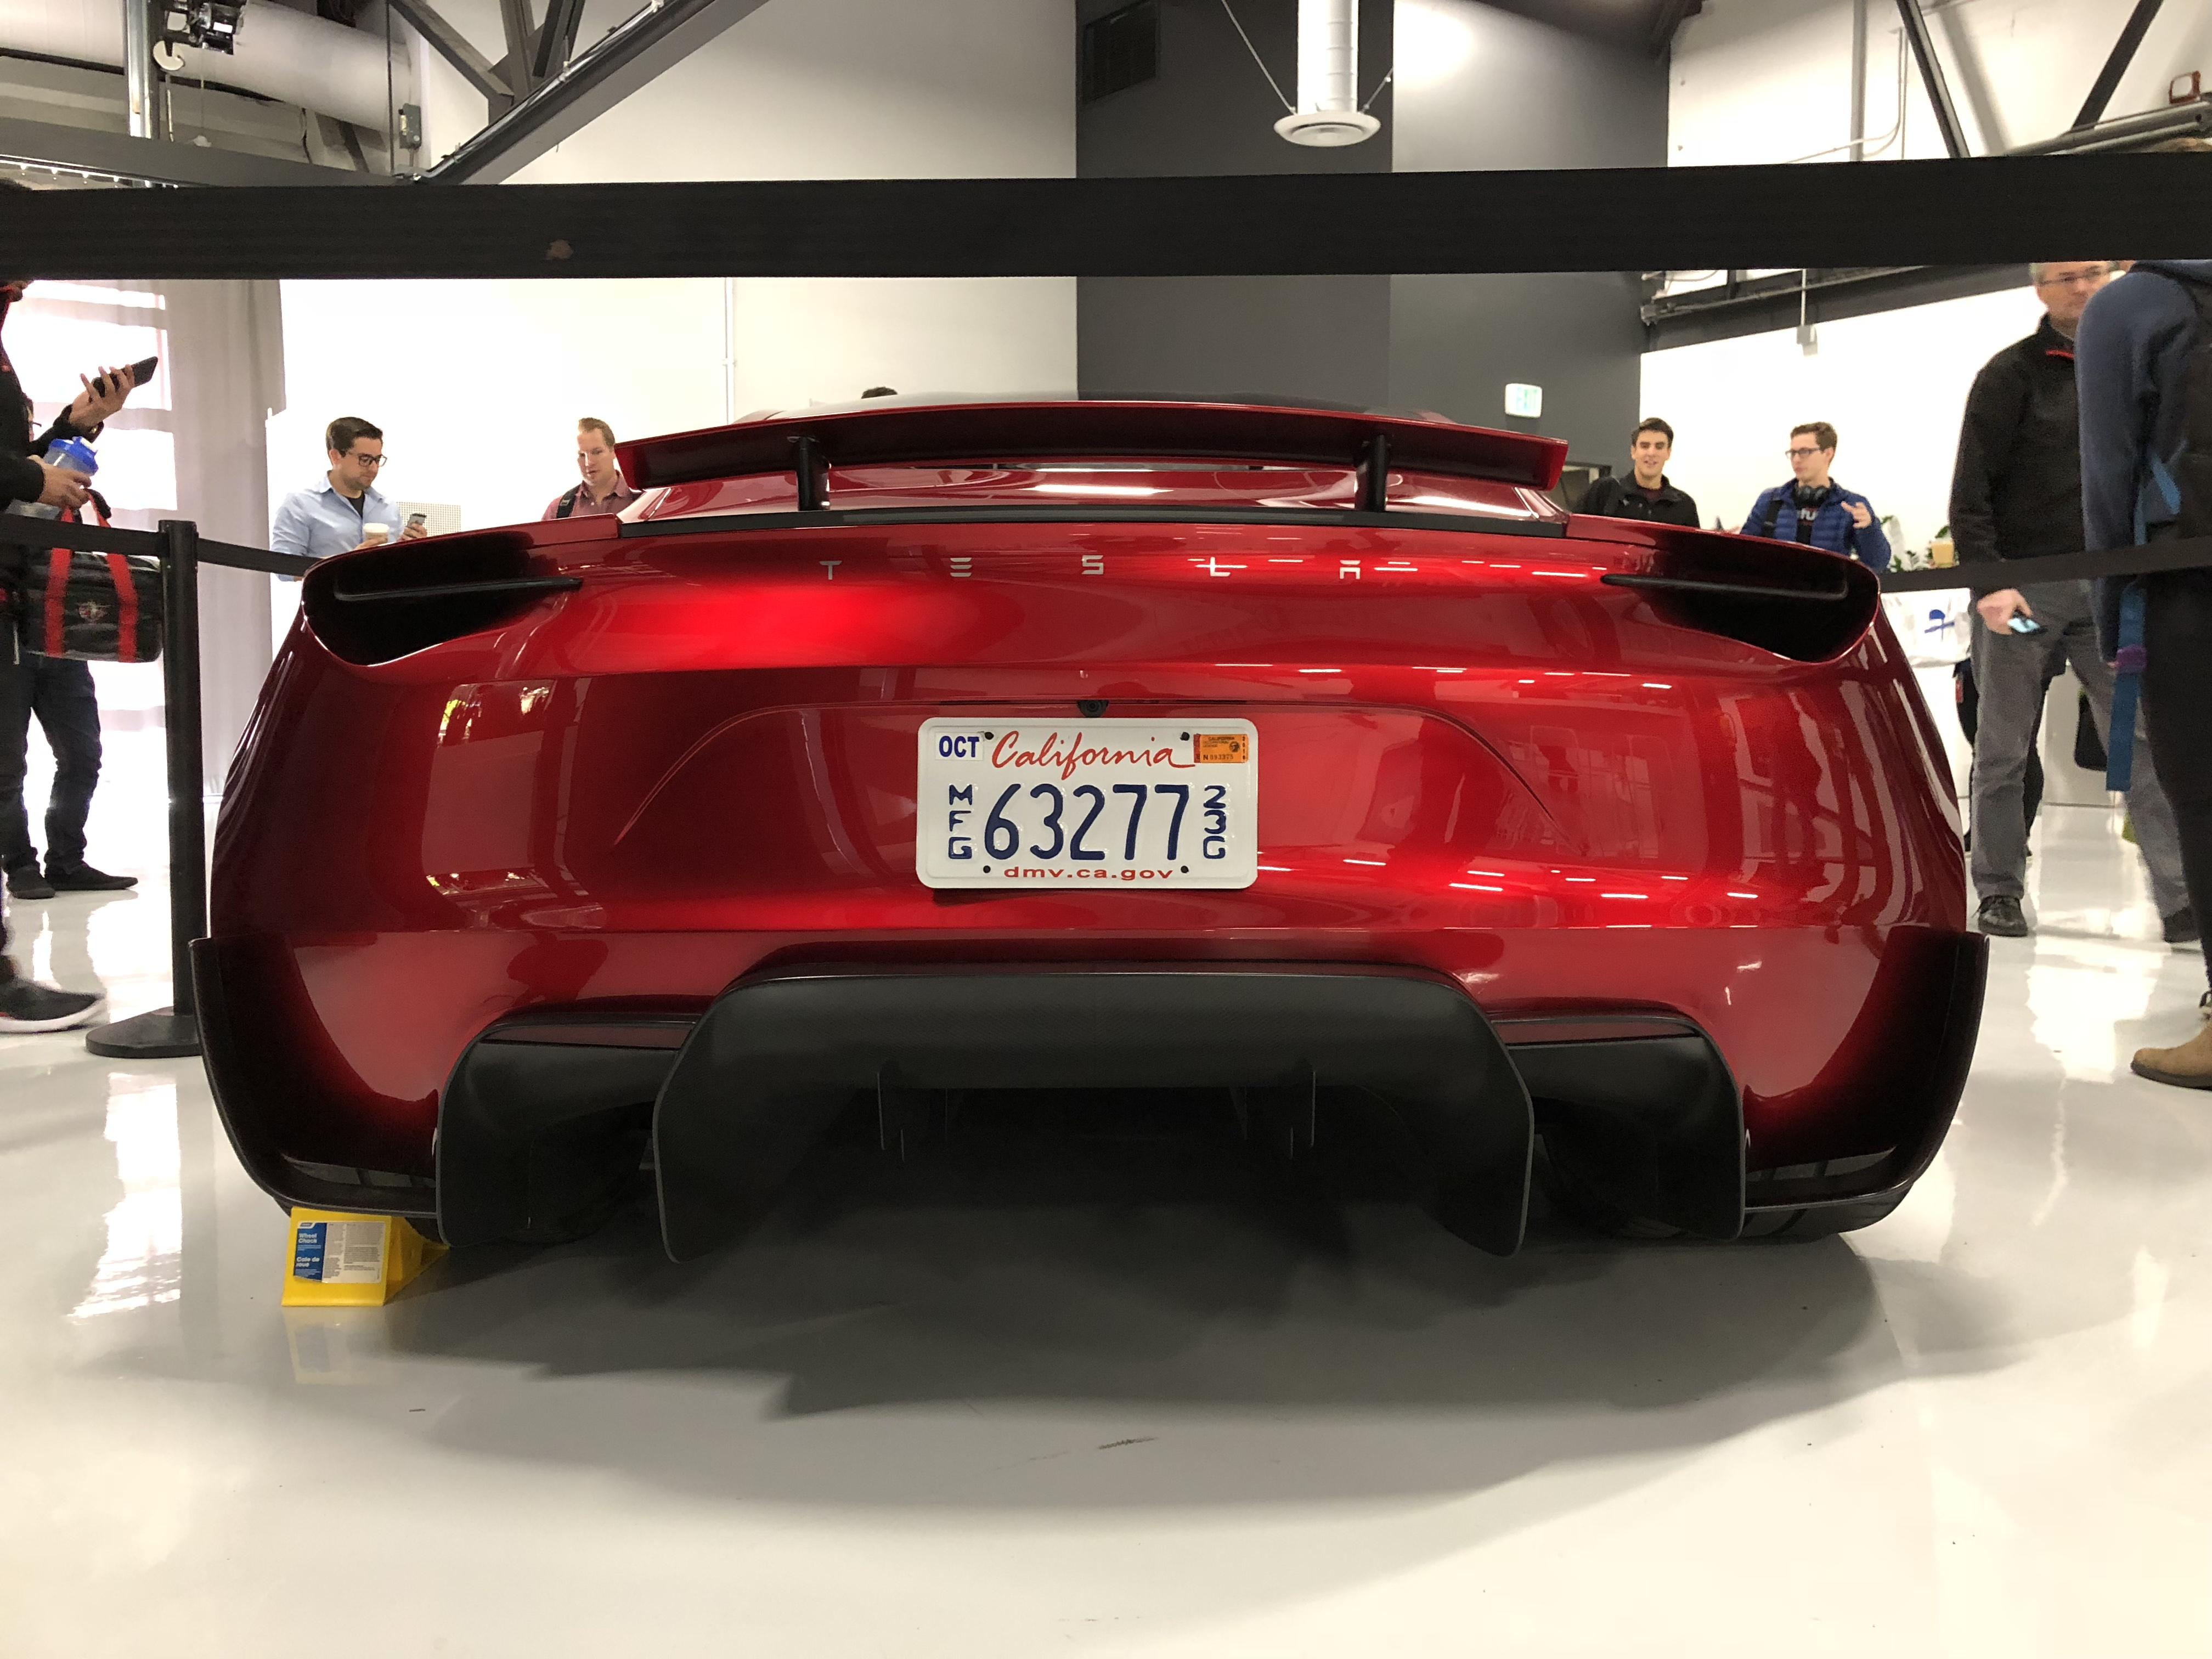 red-tesla-roadster-palo-alto-hq-5